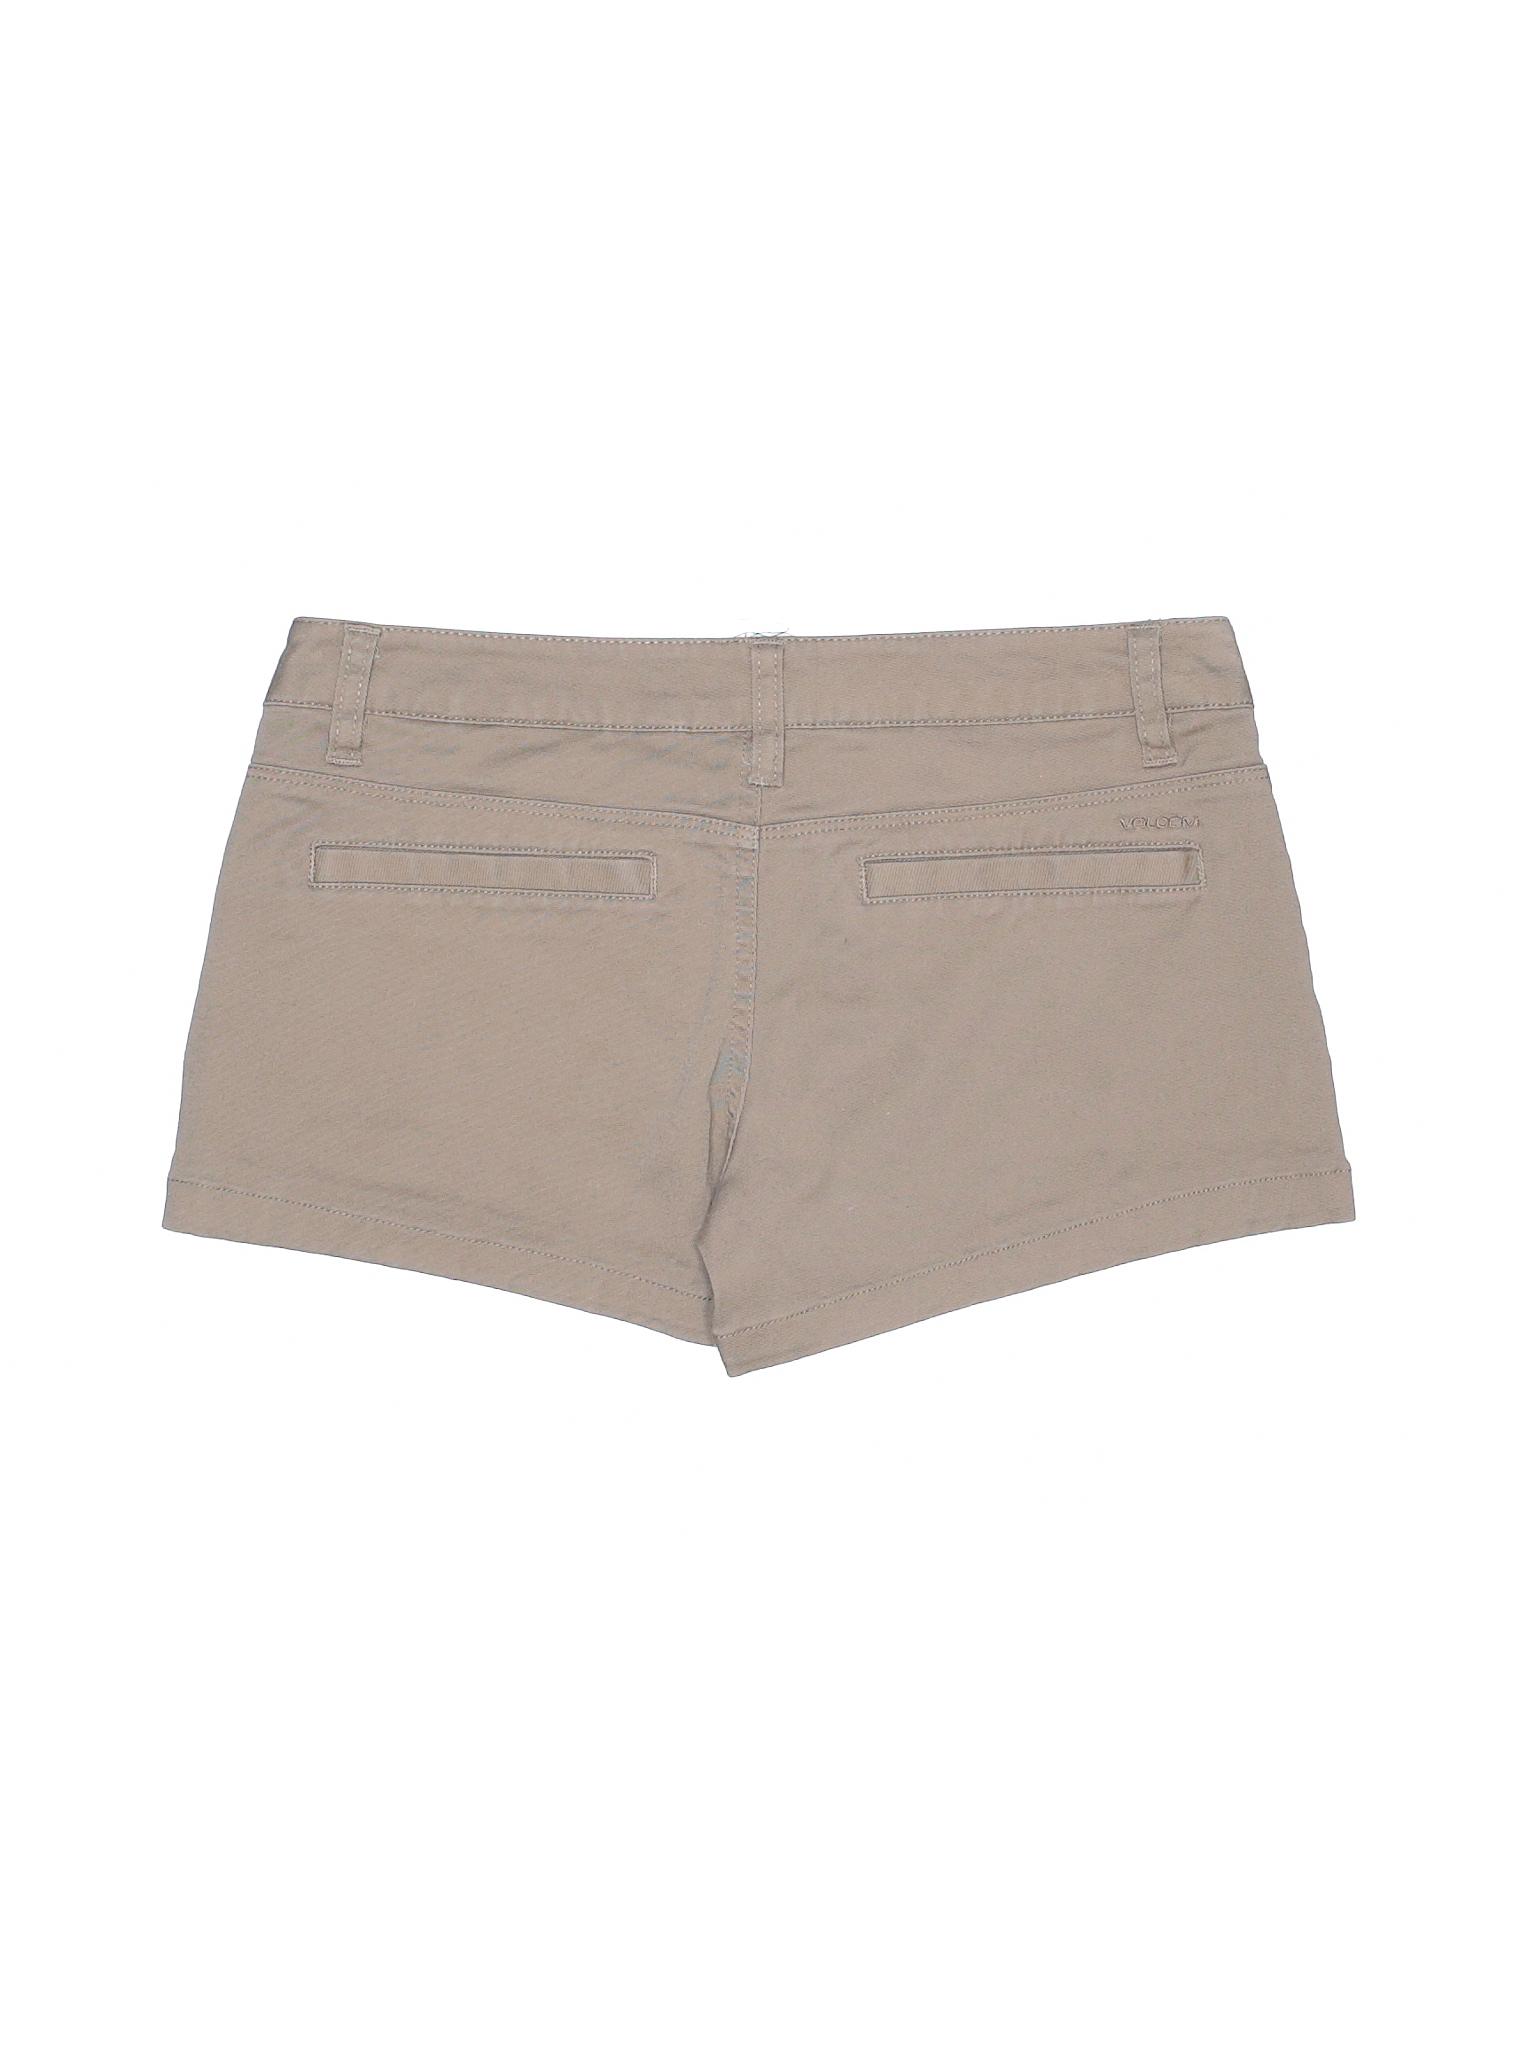 Volcom Shorts Boutique Volcom Boutique Khaki IwIf7qx